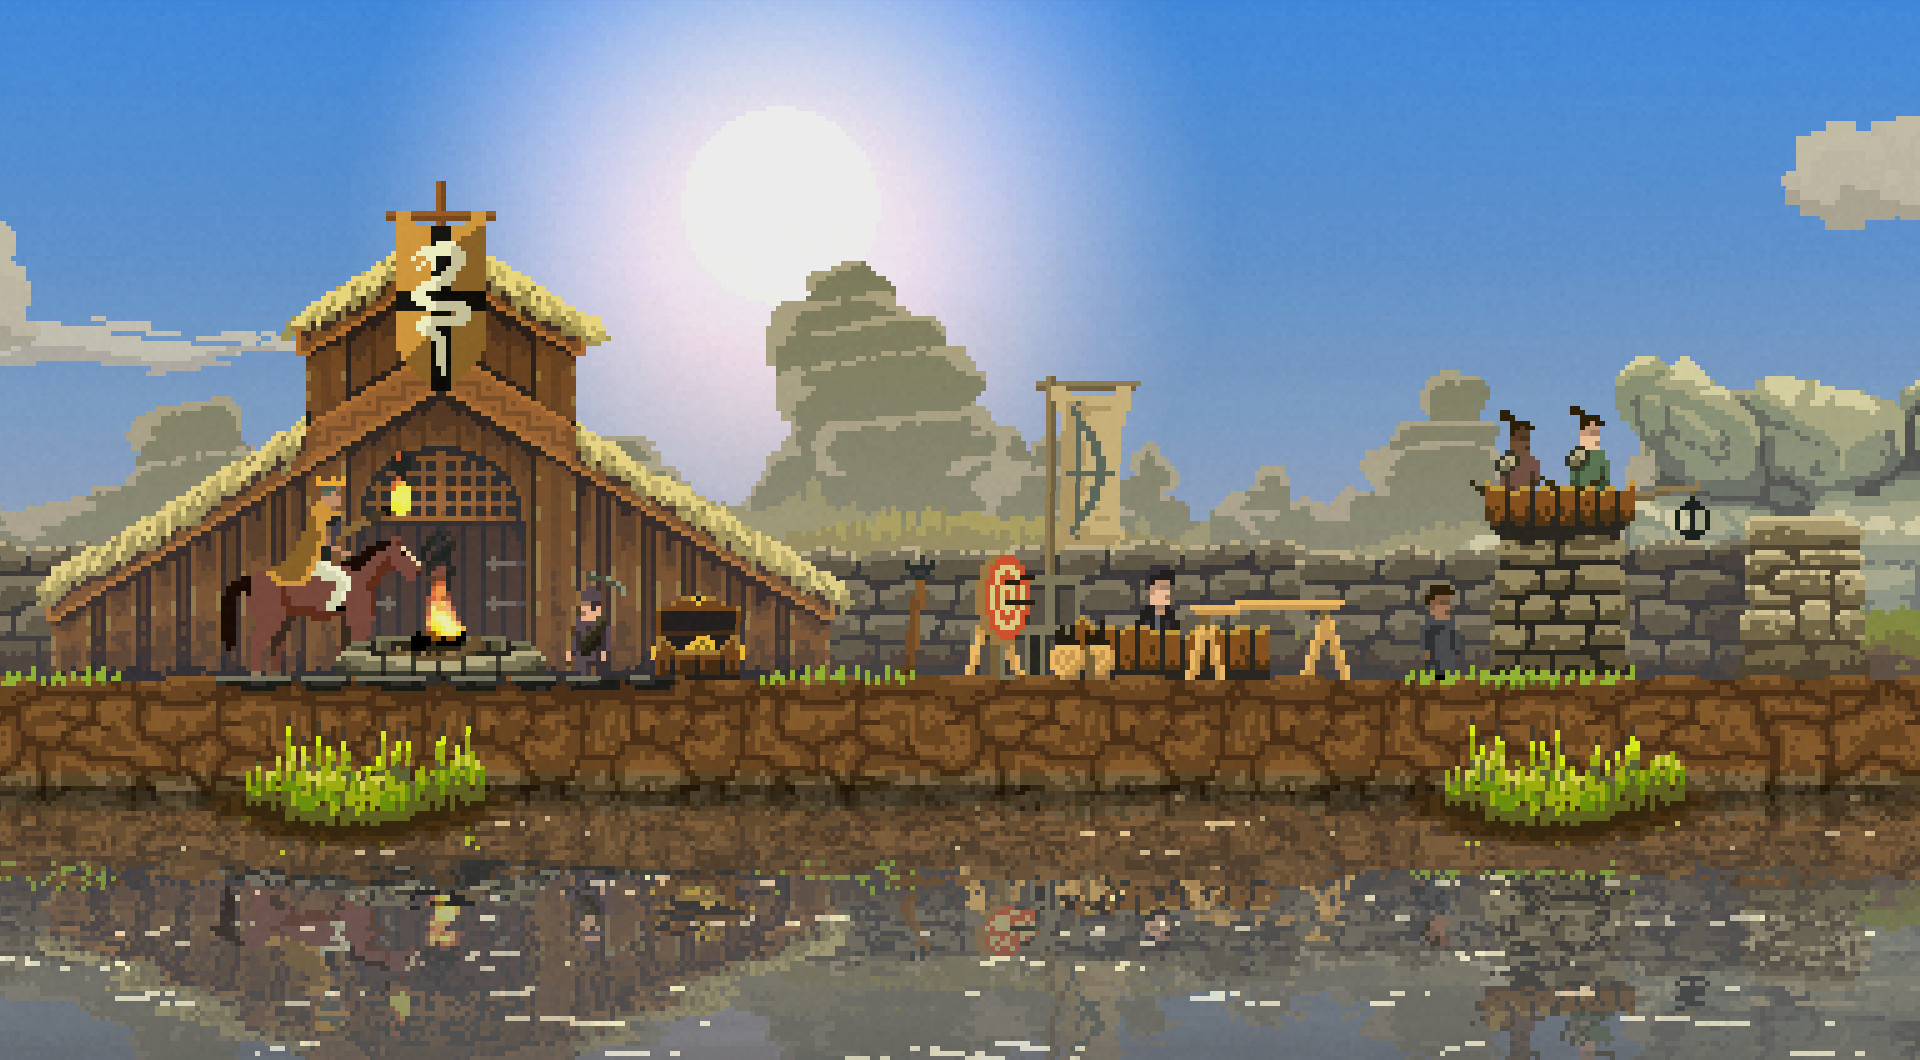 Kingdom screenshot 1